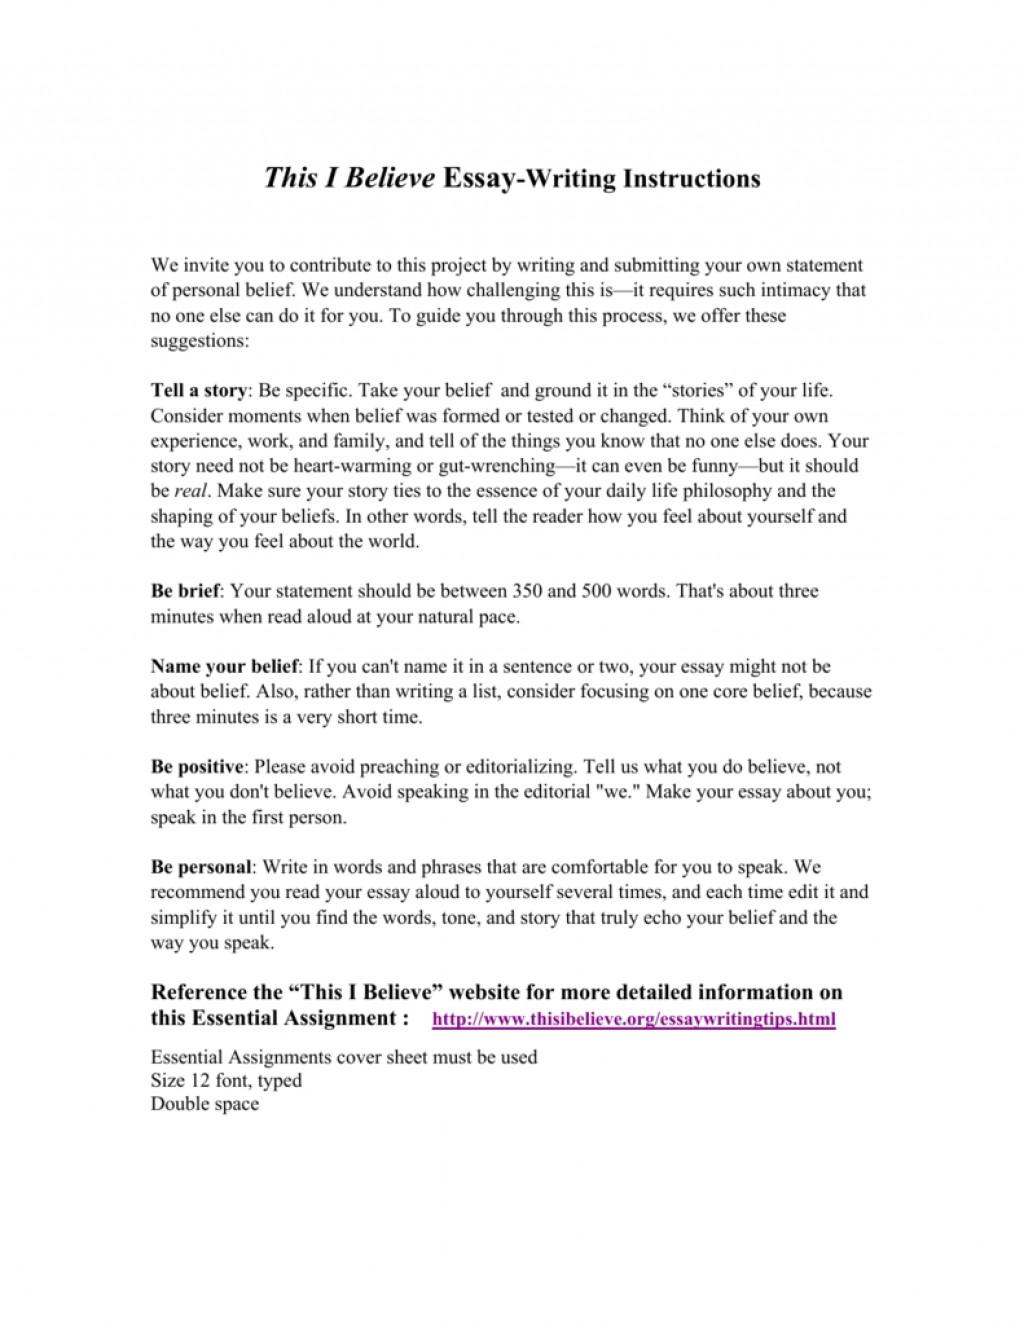 003 Essay Example Thisibelieve Org Essays Featured 008807219 1 Amazing Thisibelieve.org Large